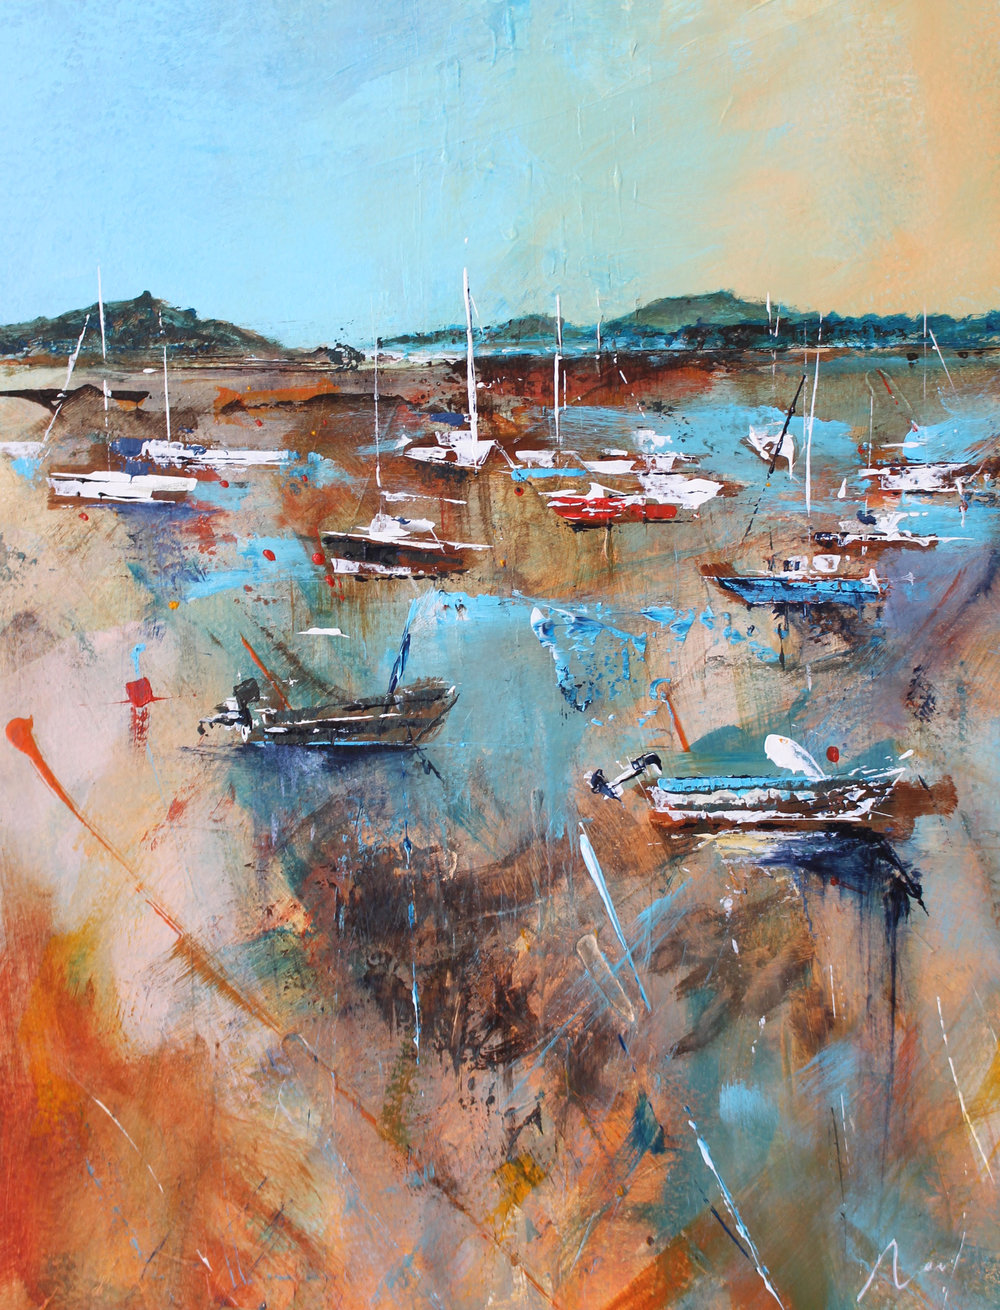 19.Ringhaddy Boats, Strangford Lough.jpg